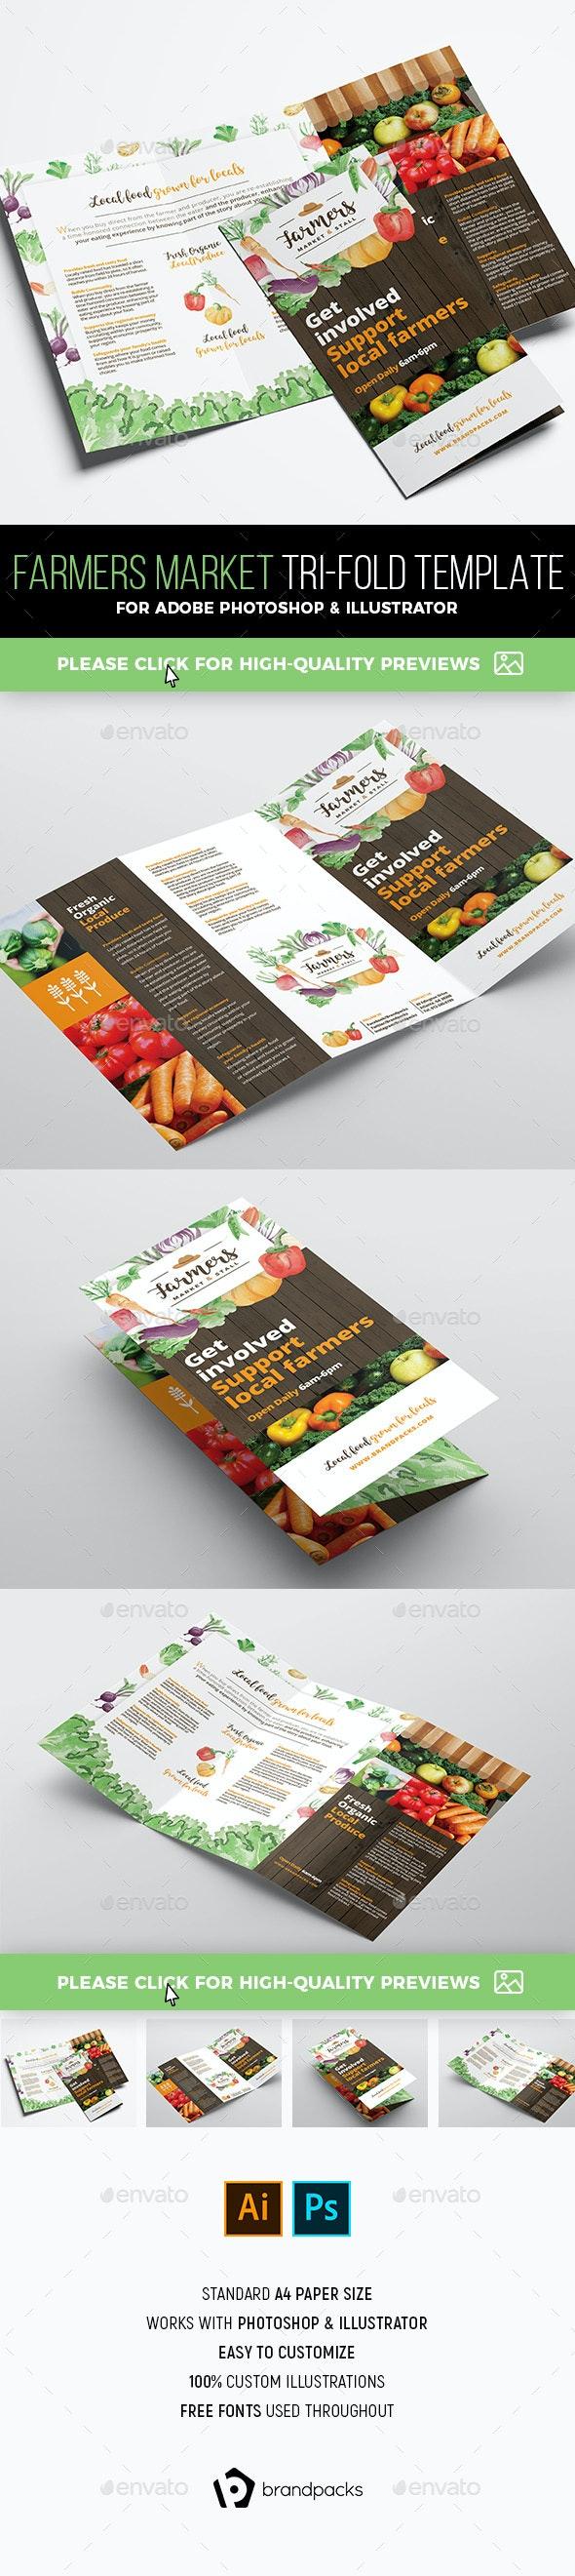 Farmers Market Tri-Fold Brochure Template - Informational Brochures